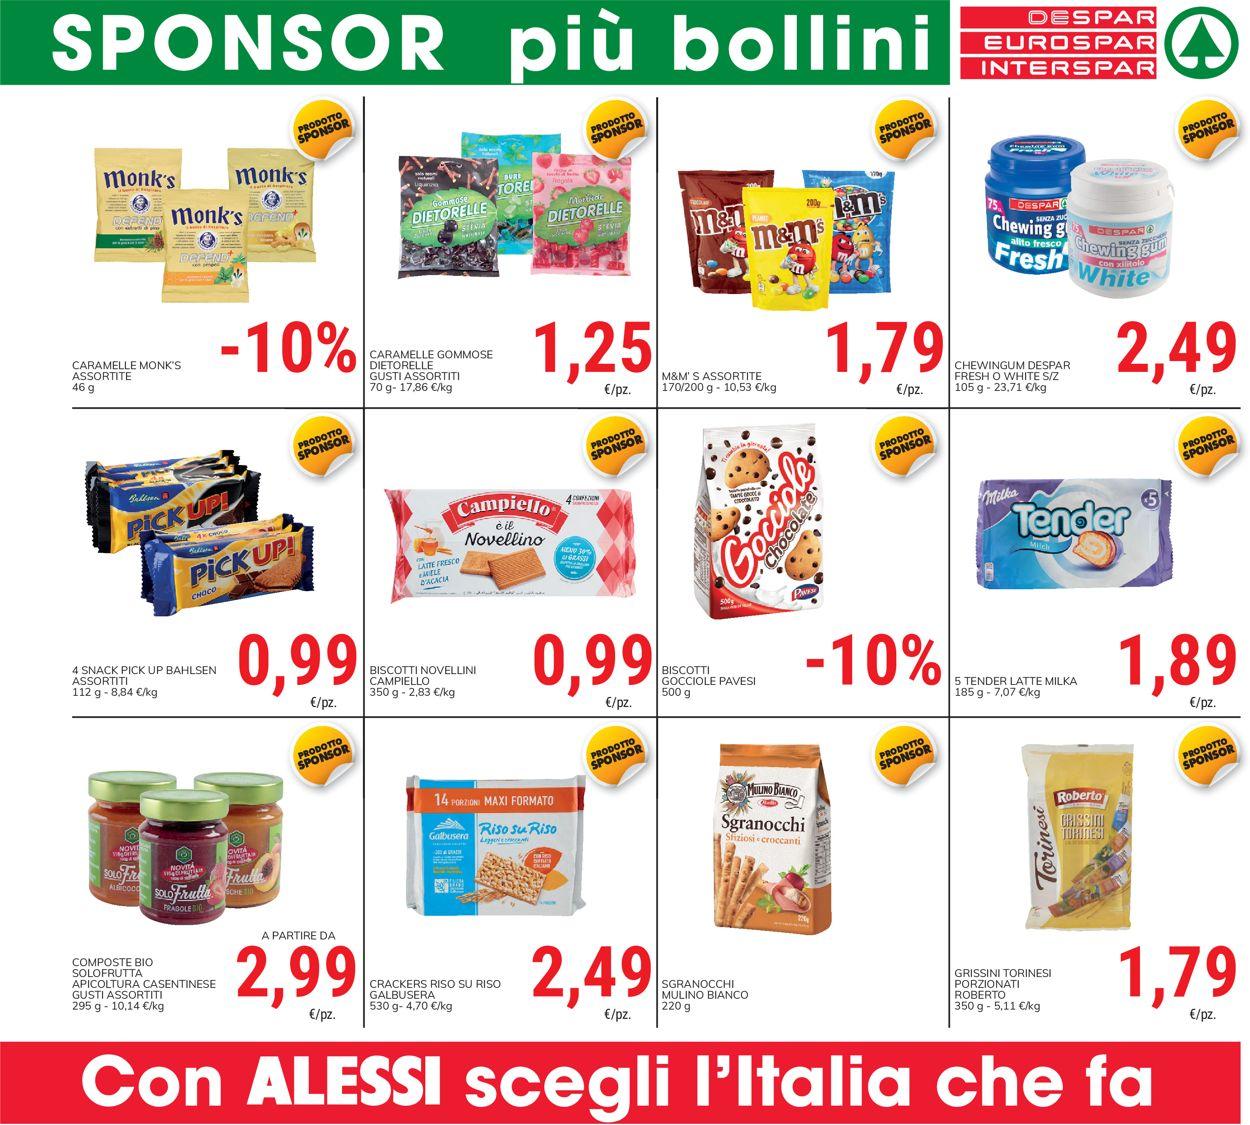 Volantino Interspar - Offerte 15/03-07/04/2021 (Pagina 9)